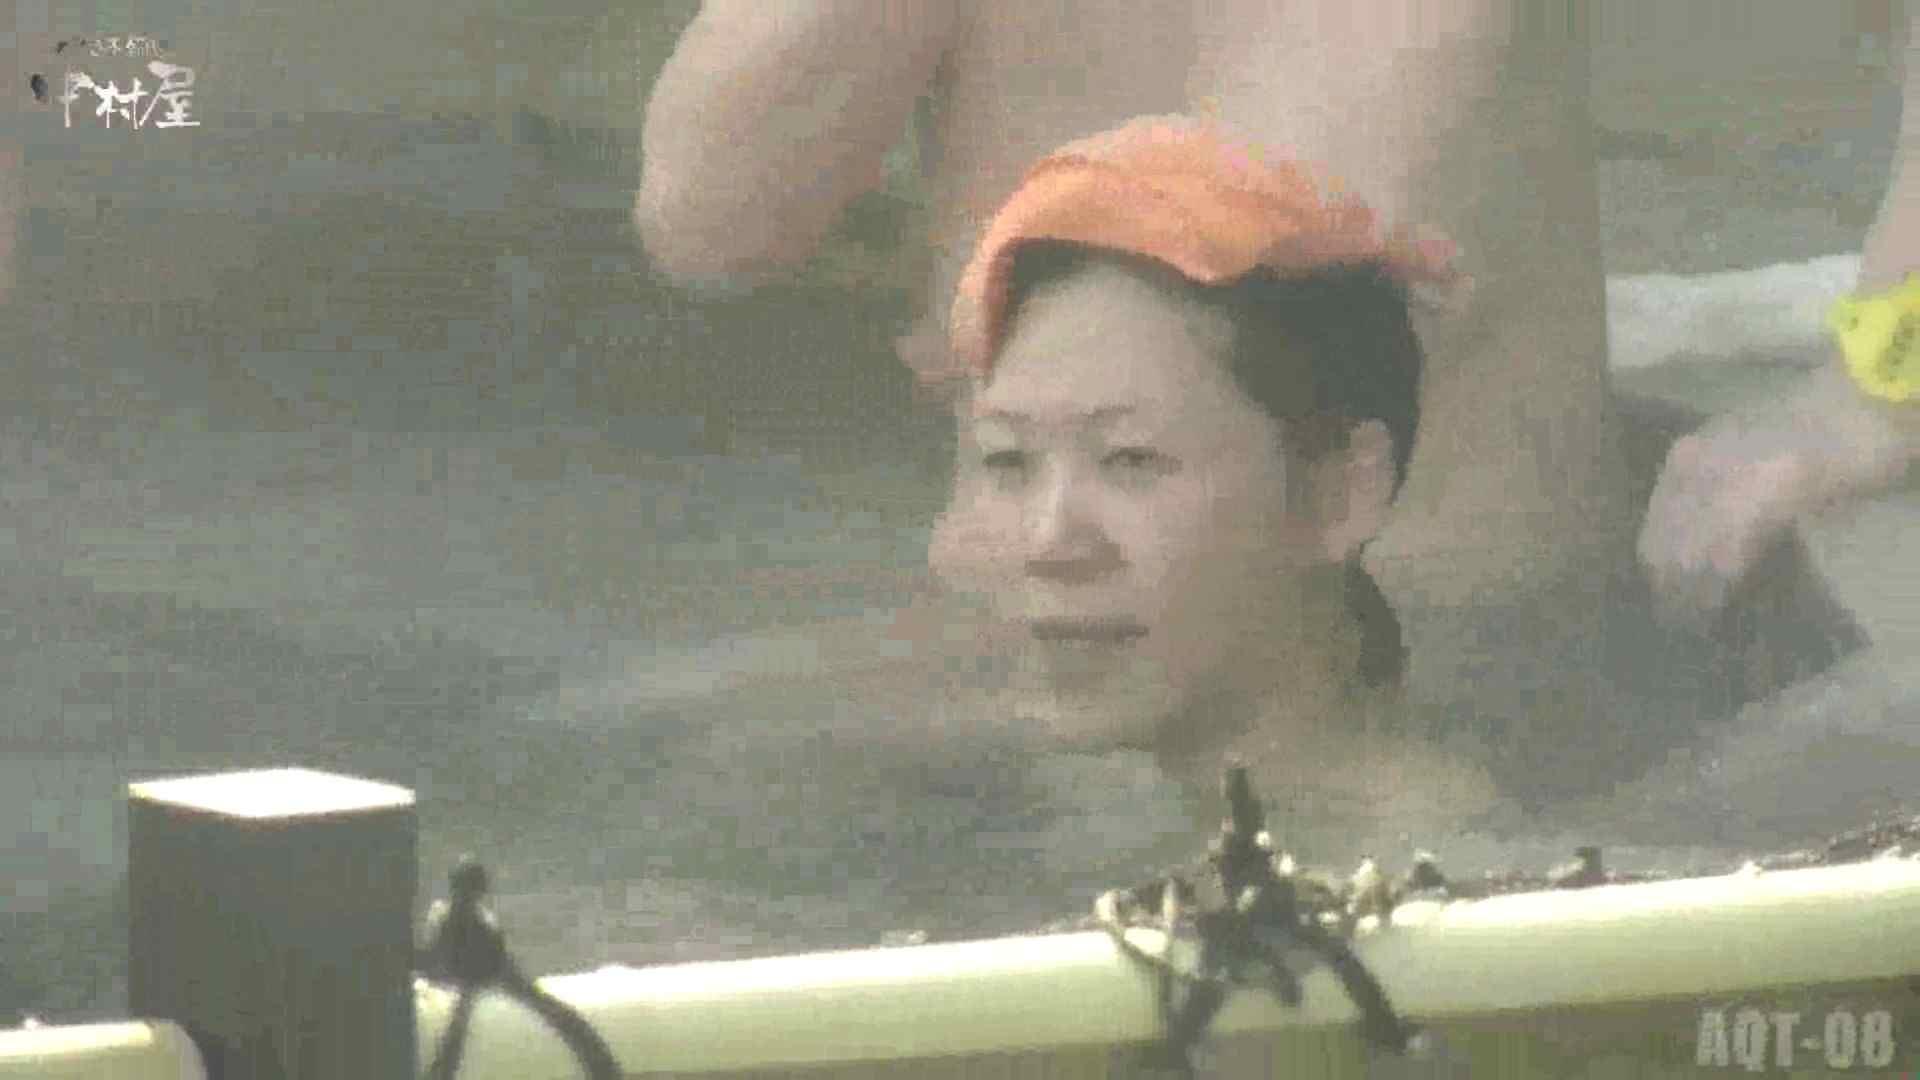 Aquaな露天風呂Vol.872潜入盗撮露天風呂八判湯 其の六 露天   潜入シリーズ  75pic 11